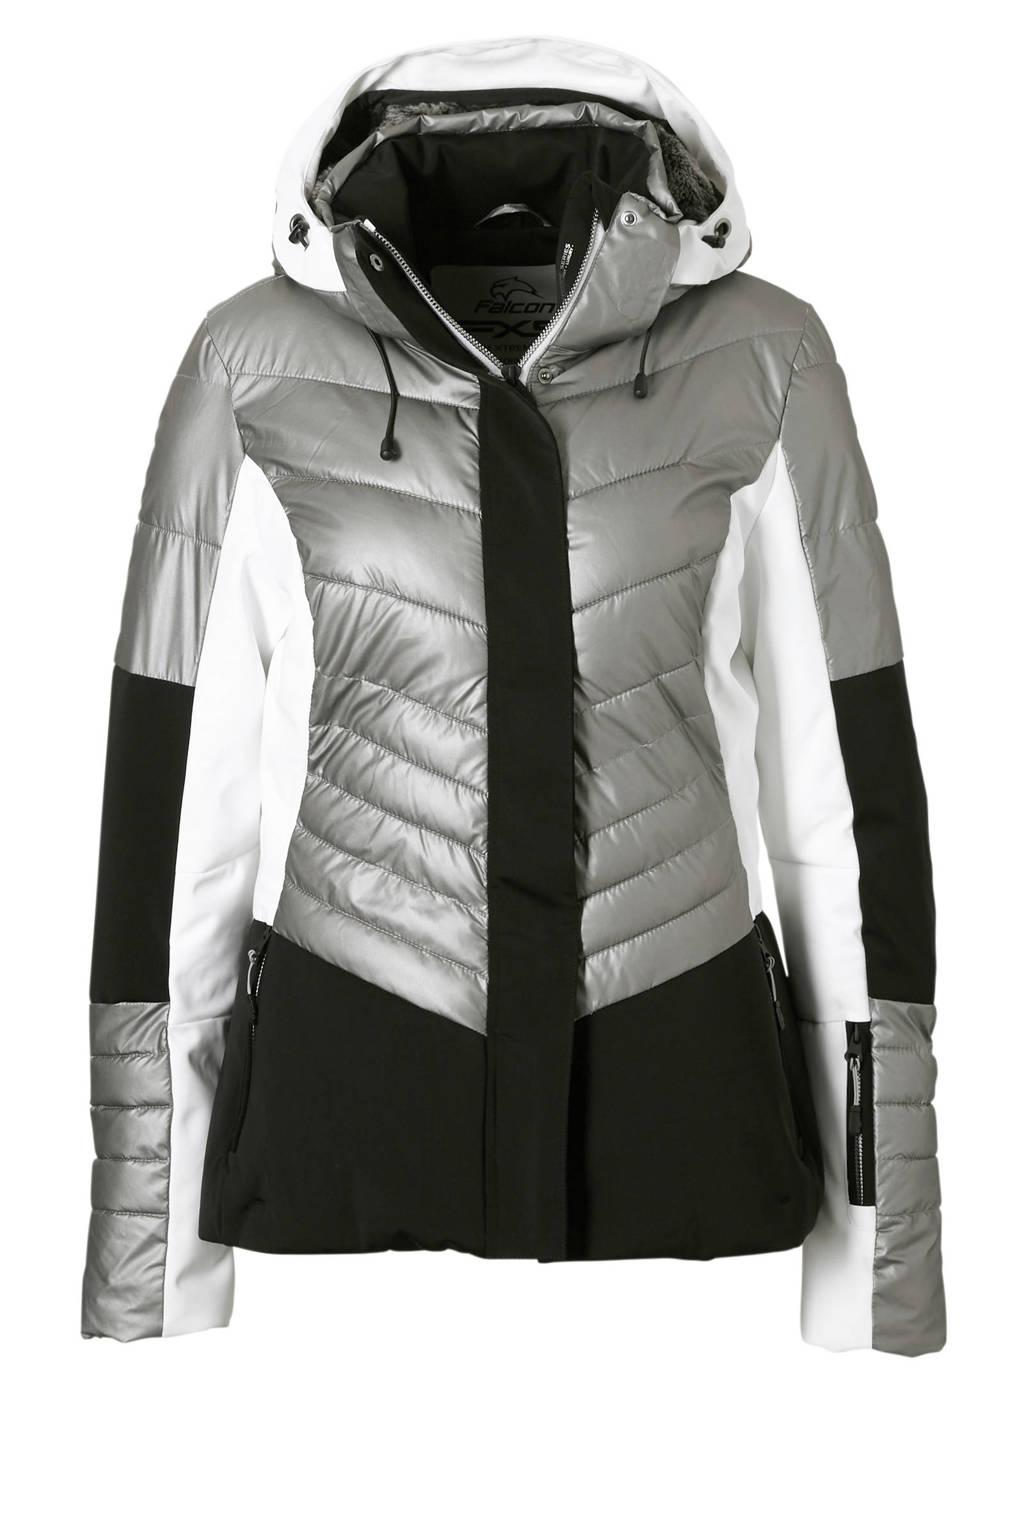 Falcon ski-jack Tyndall grijs, Grijs/wit/zwart